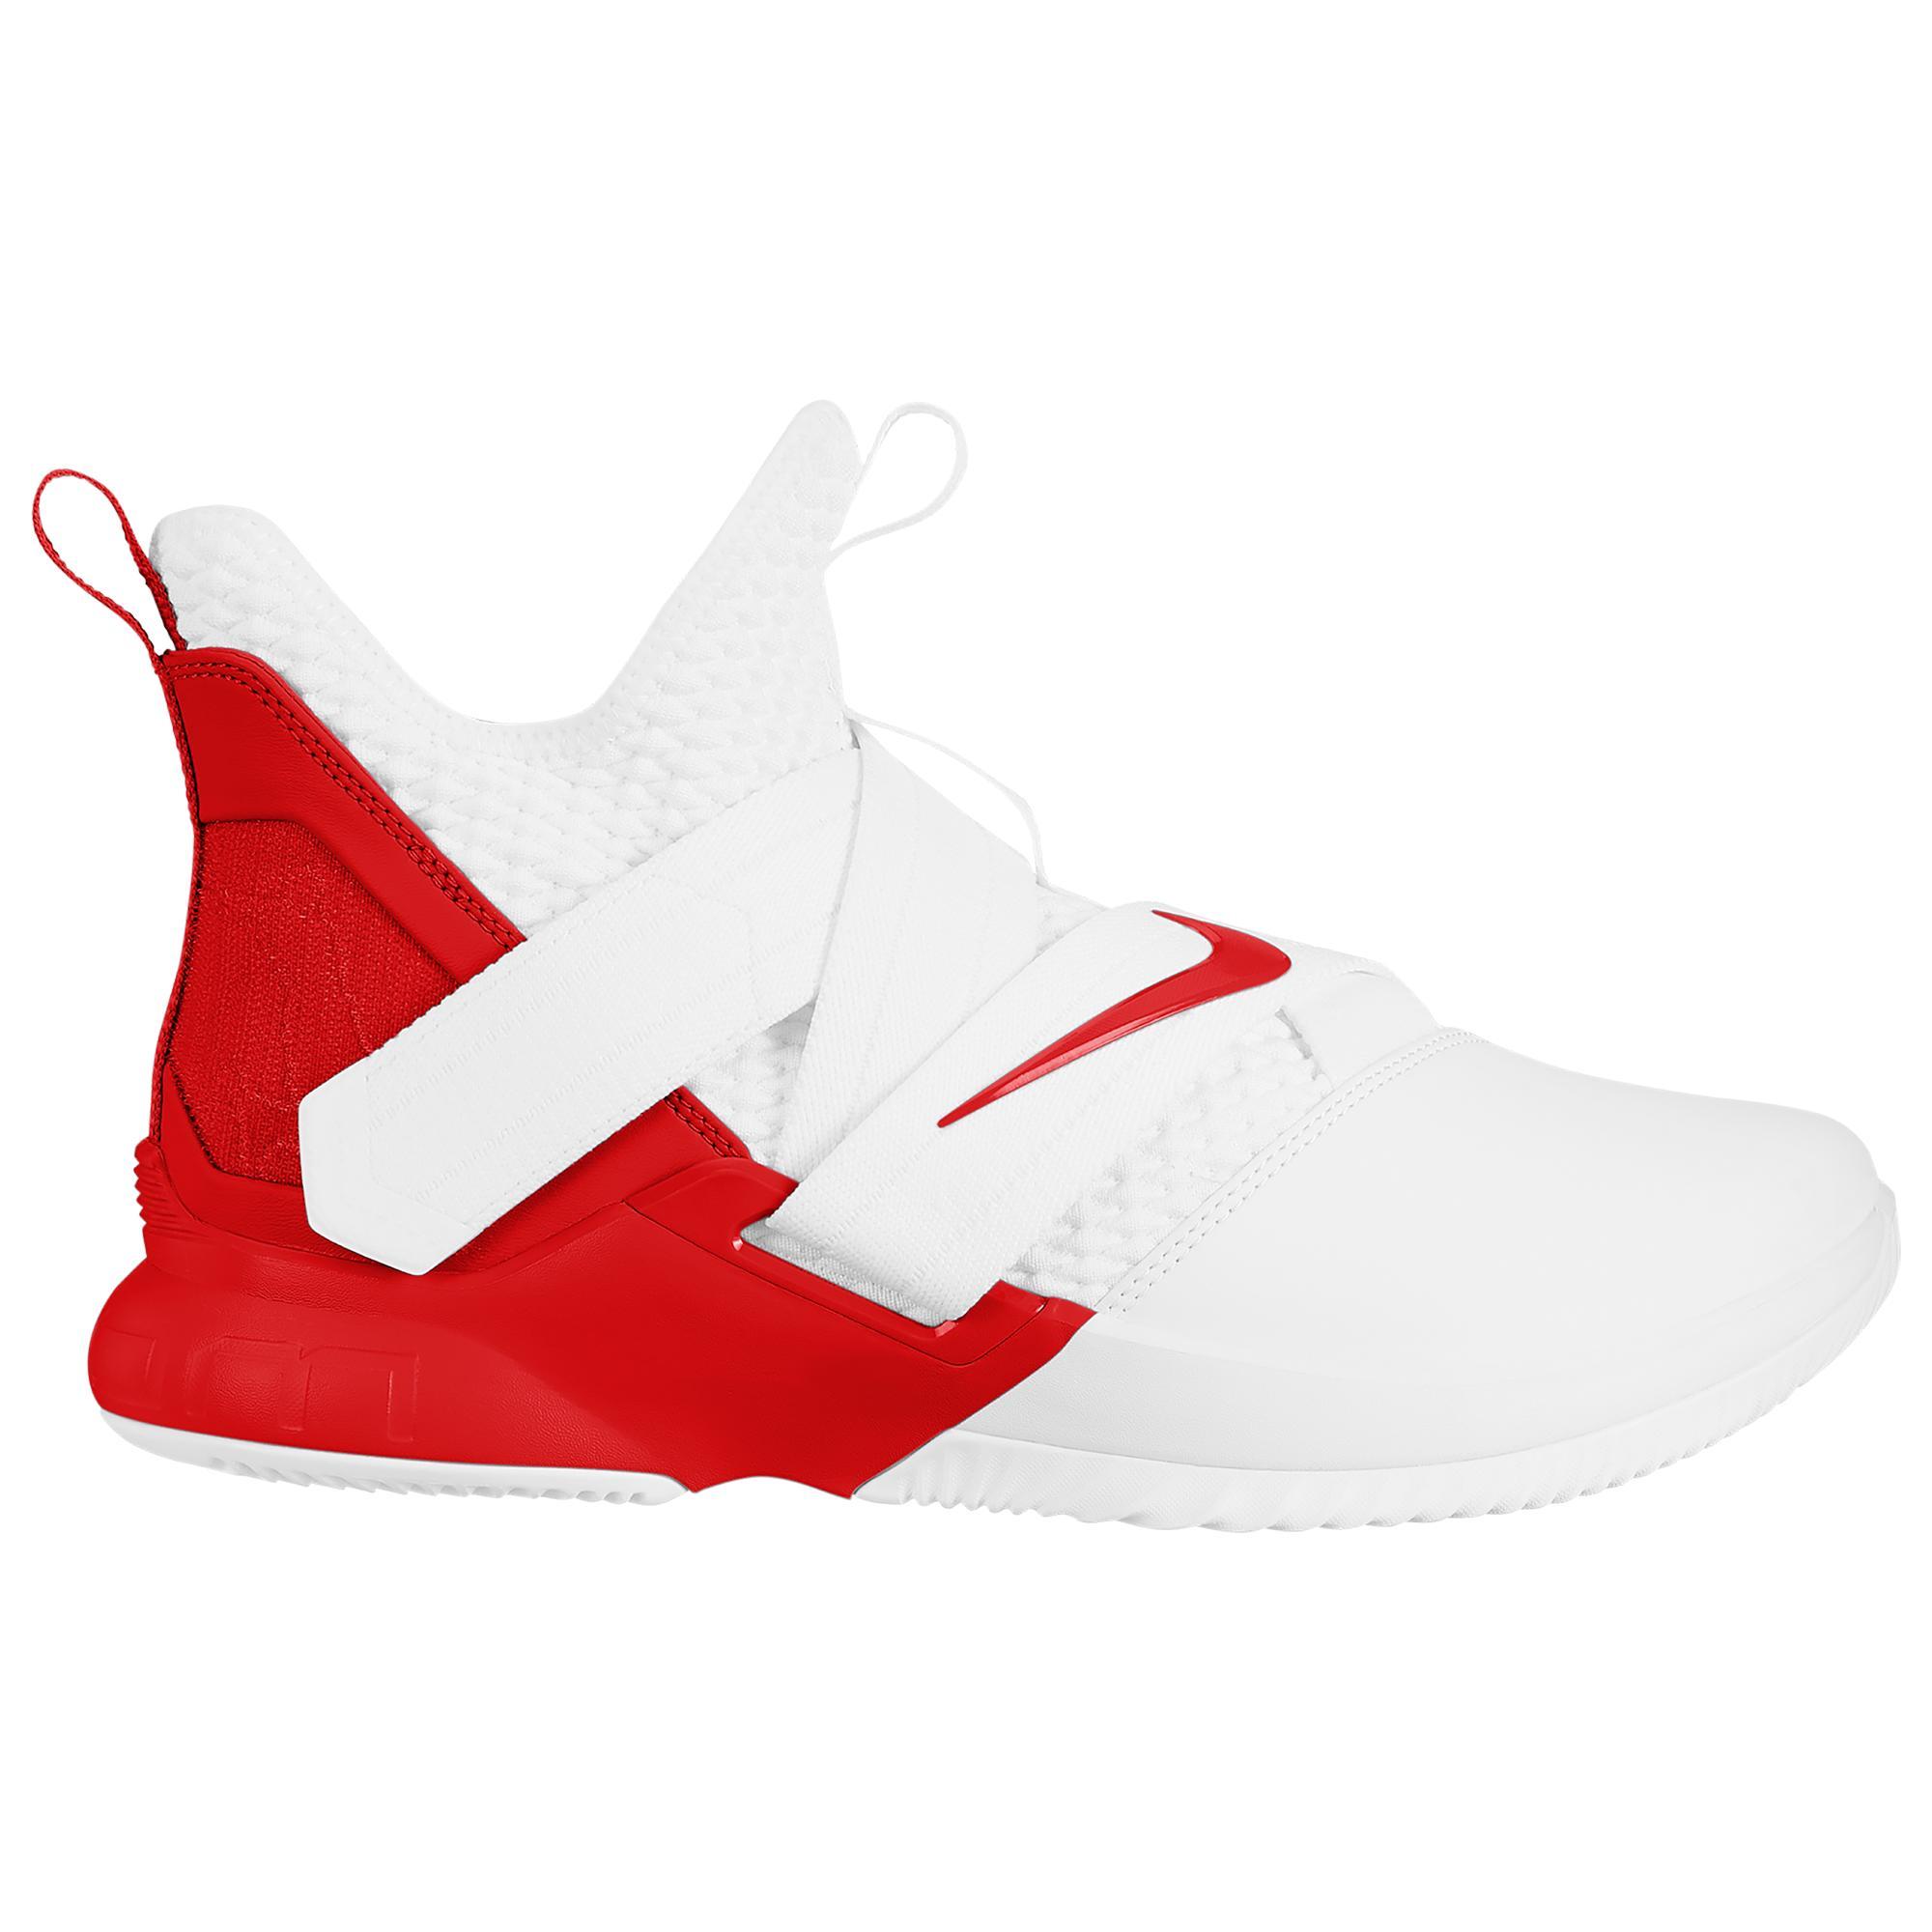 wholesale dealer 77295 e0c7c Nike Lebron James Lebron Soldier Xii in Red for Men - Lyst